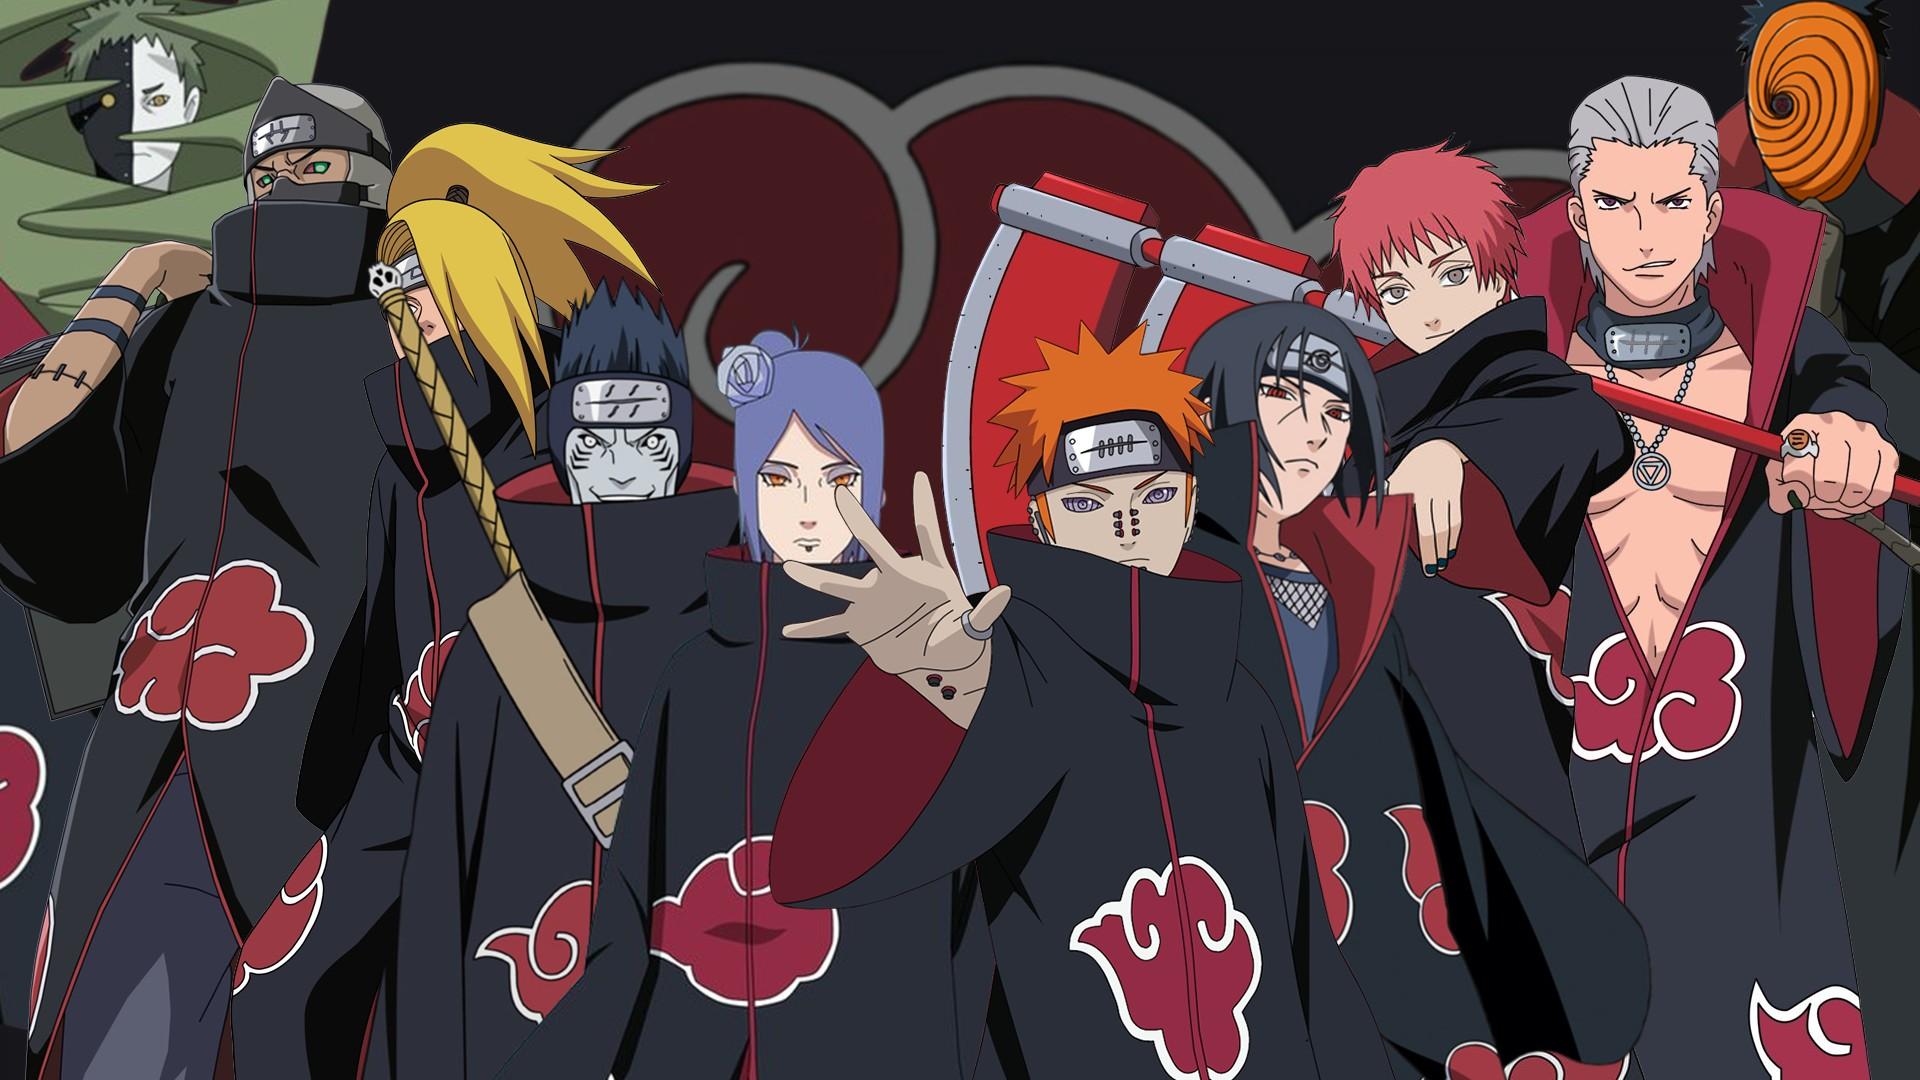 Все персонажи акацуки